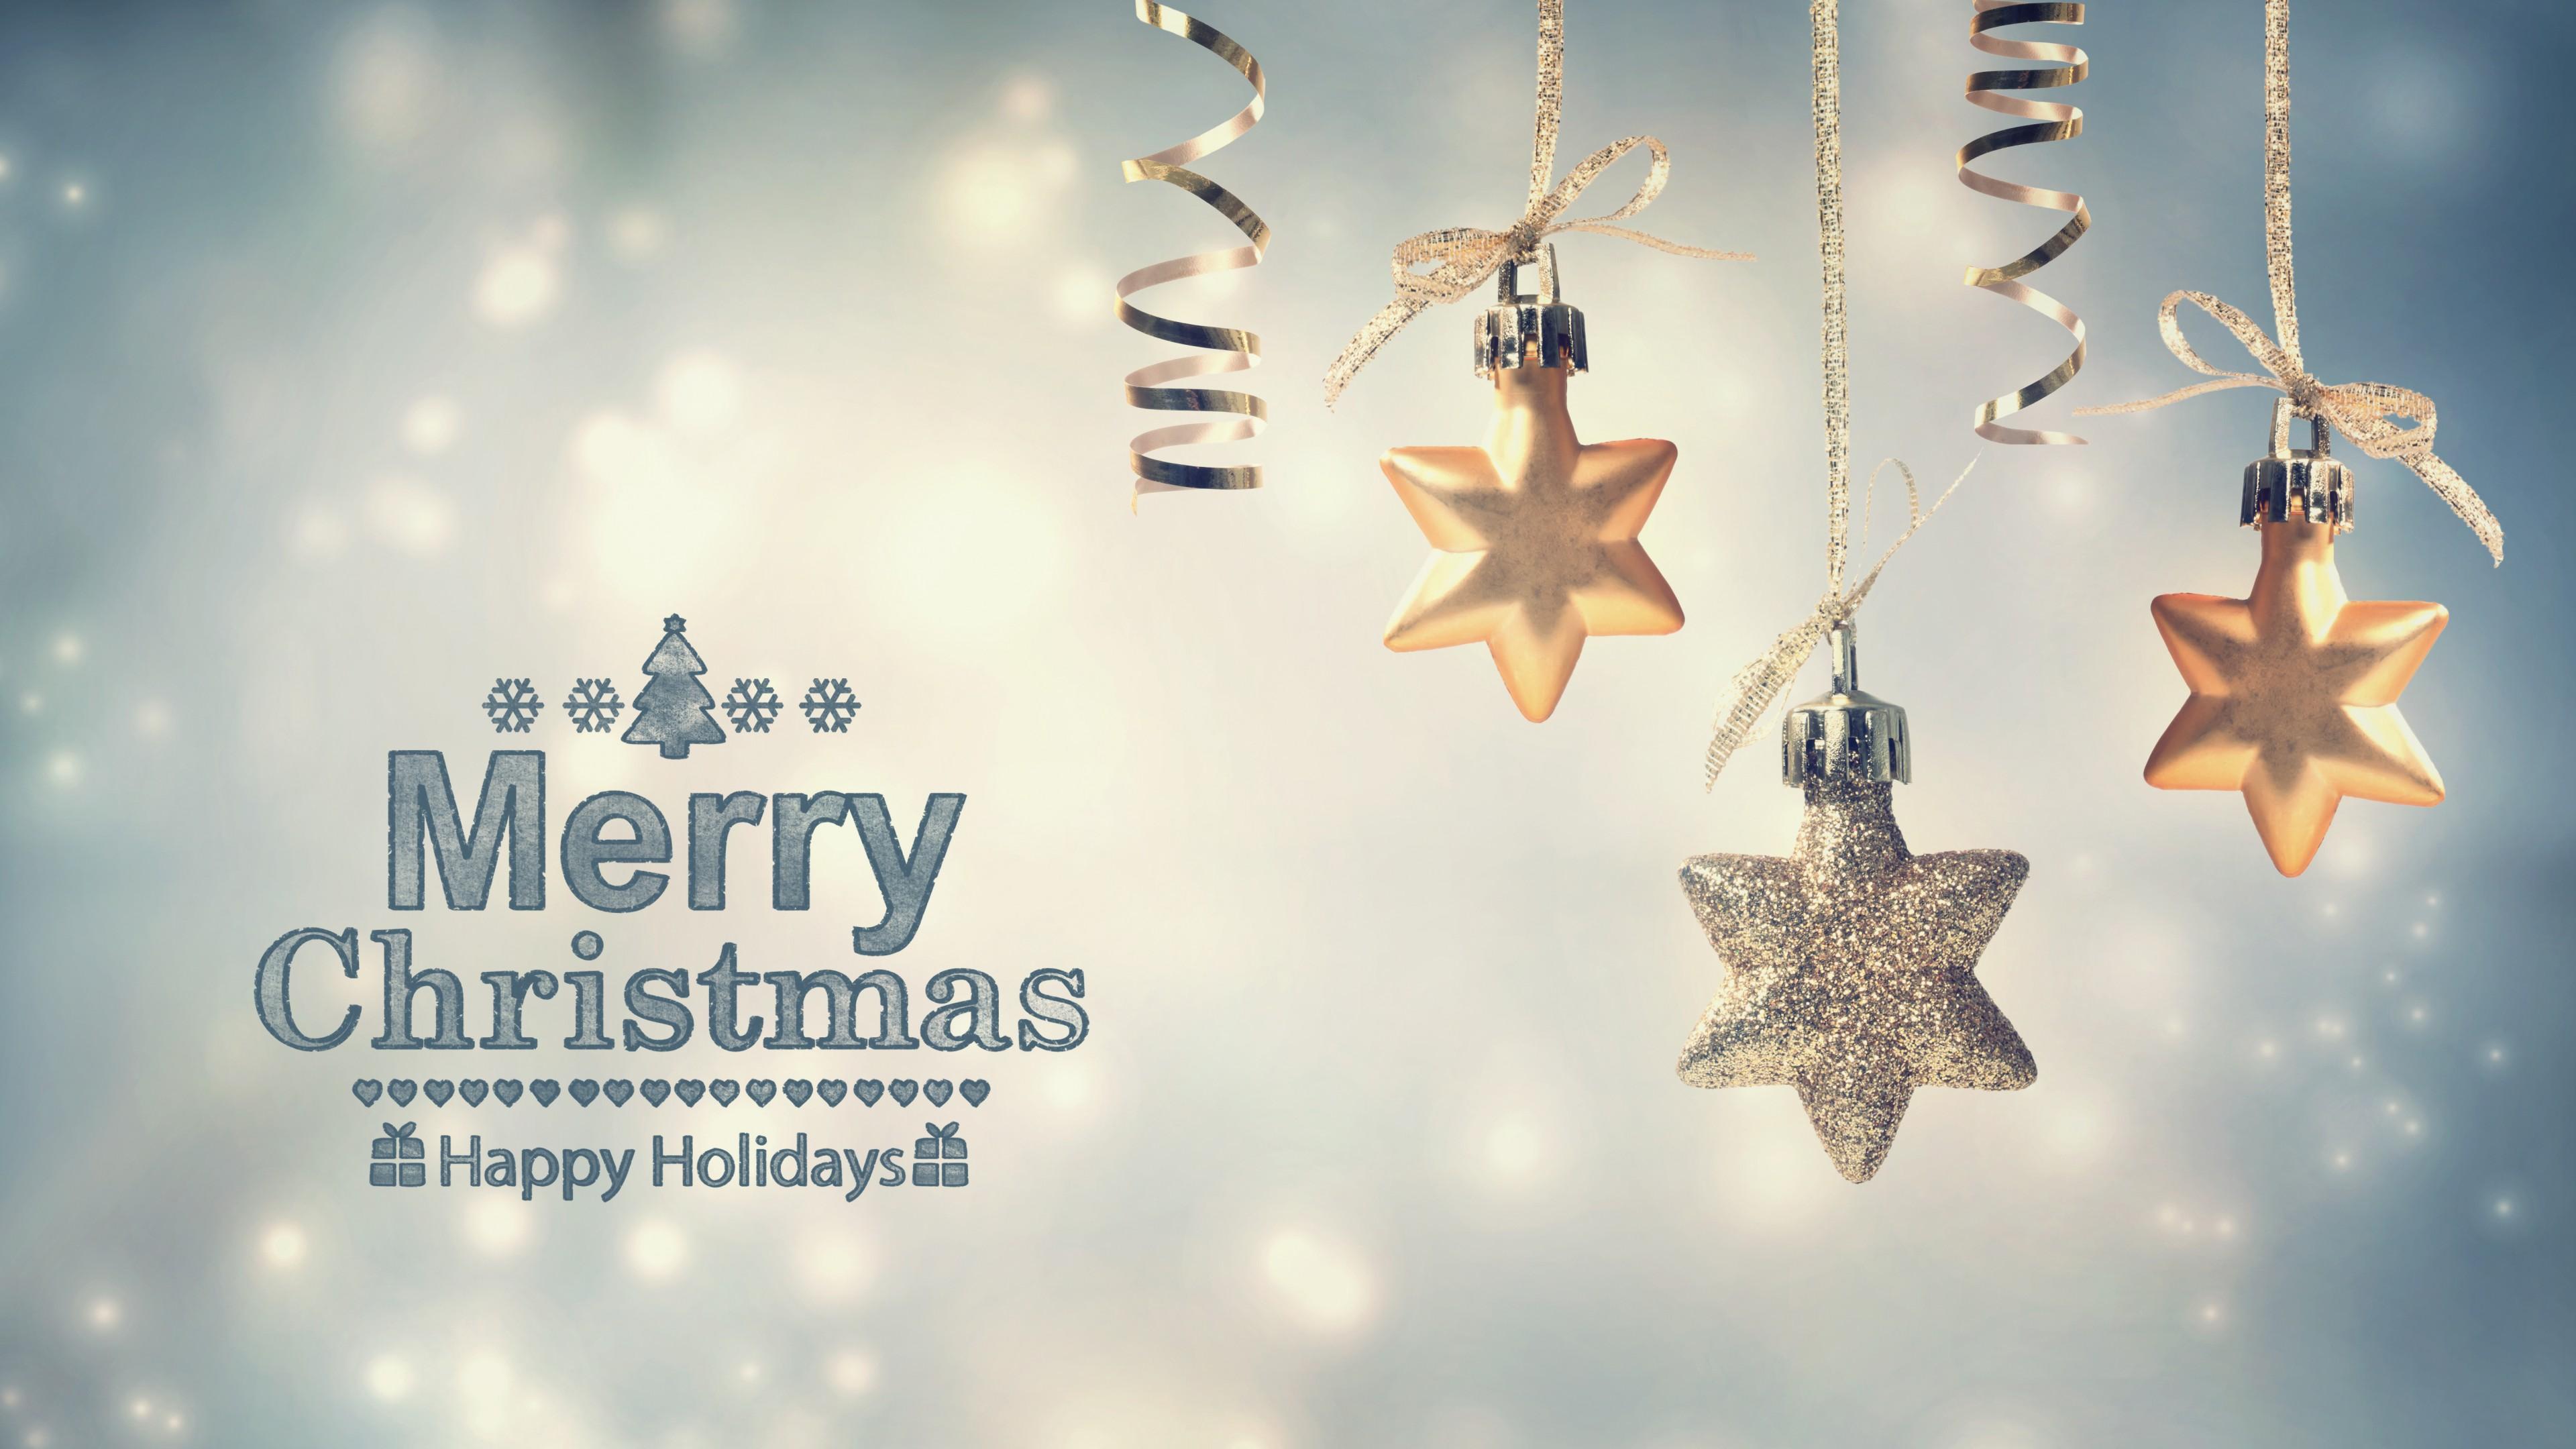 Best_4K_Christmas_Wallpapers_2017_14